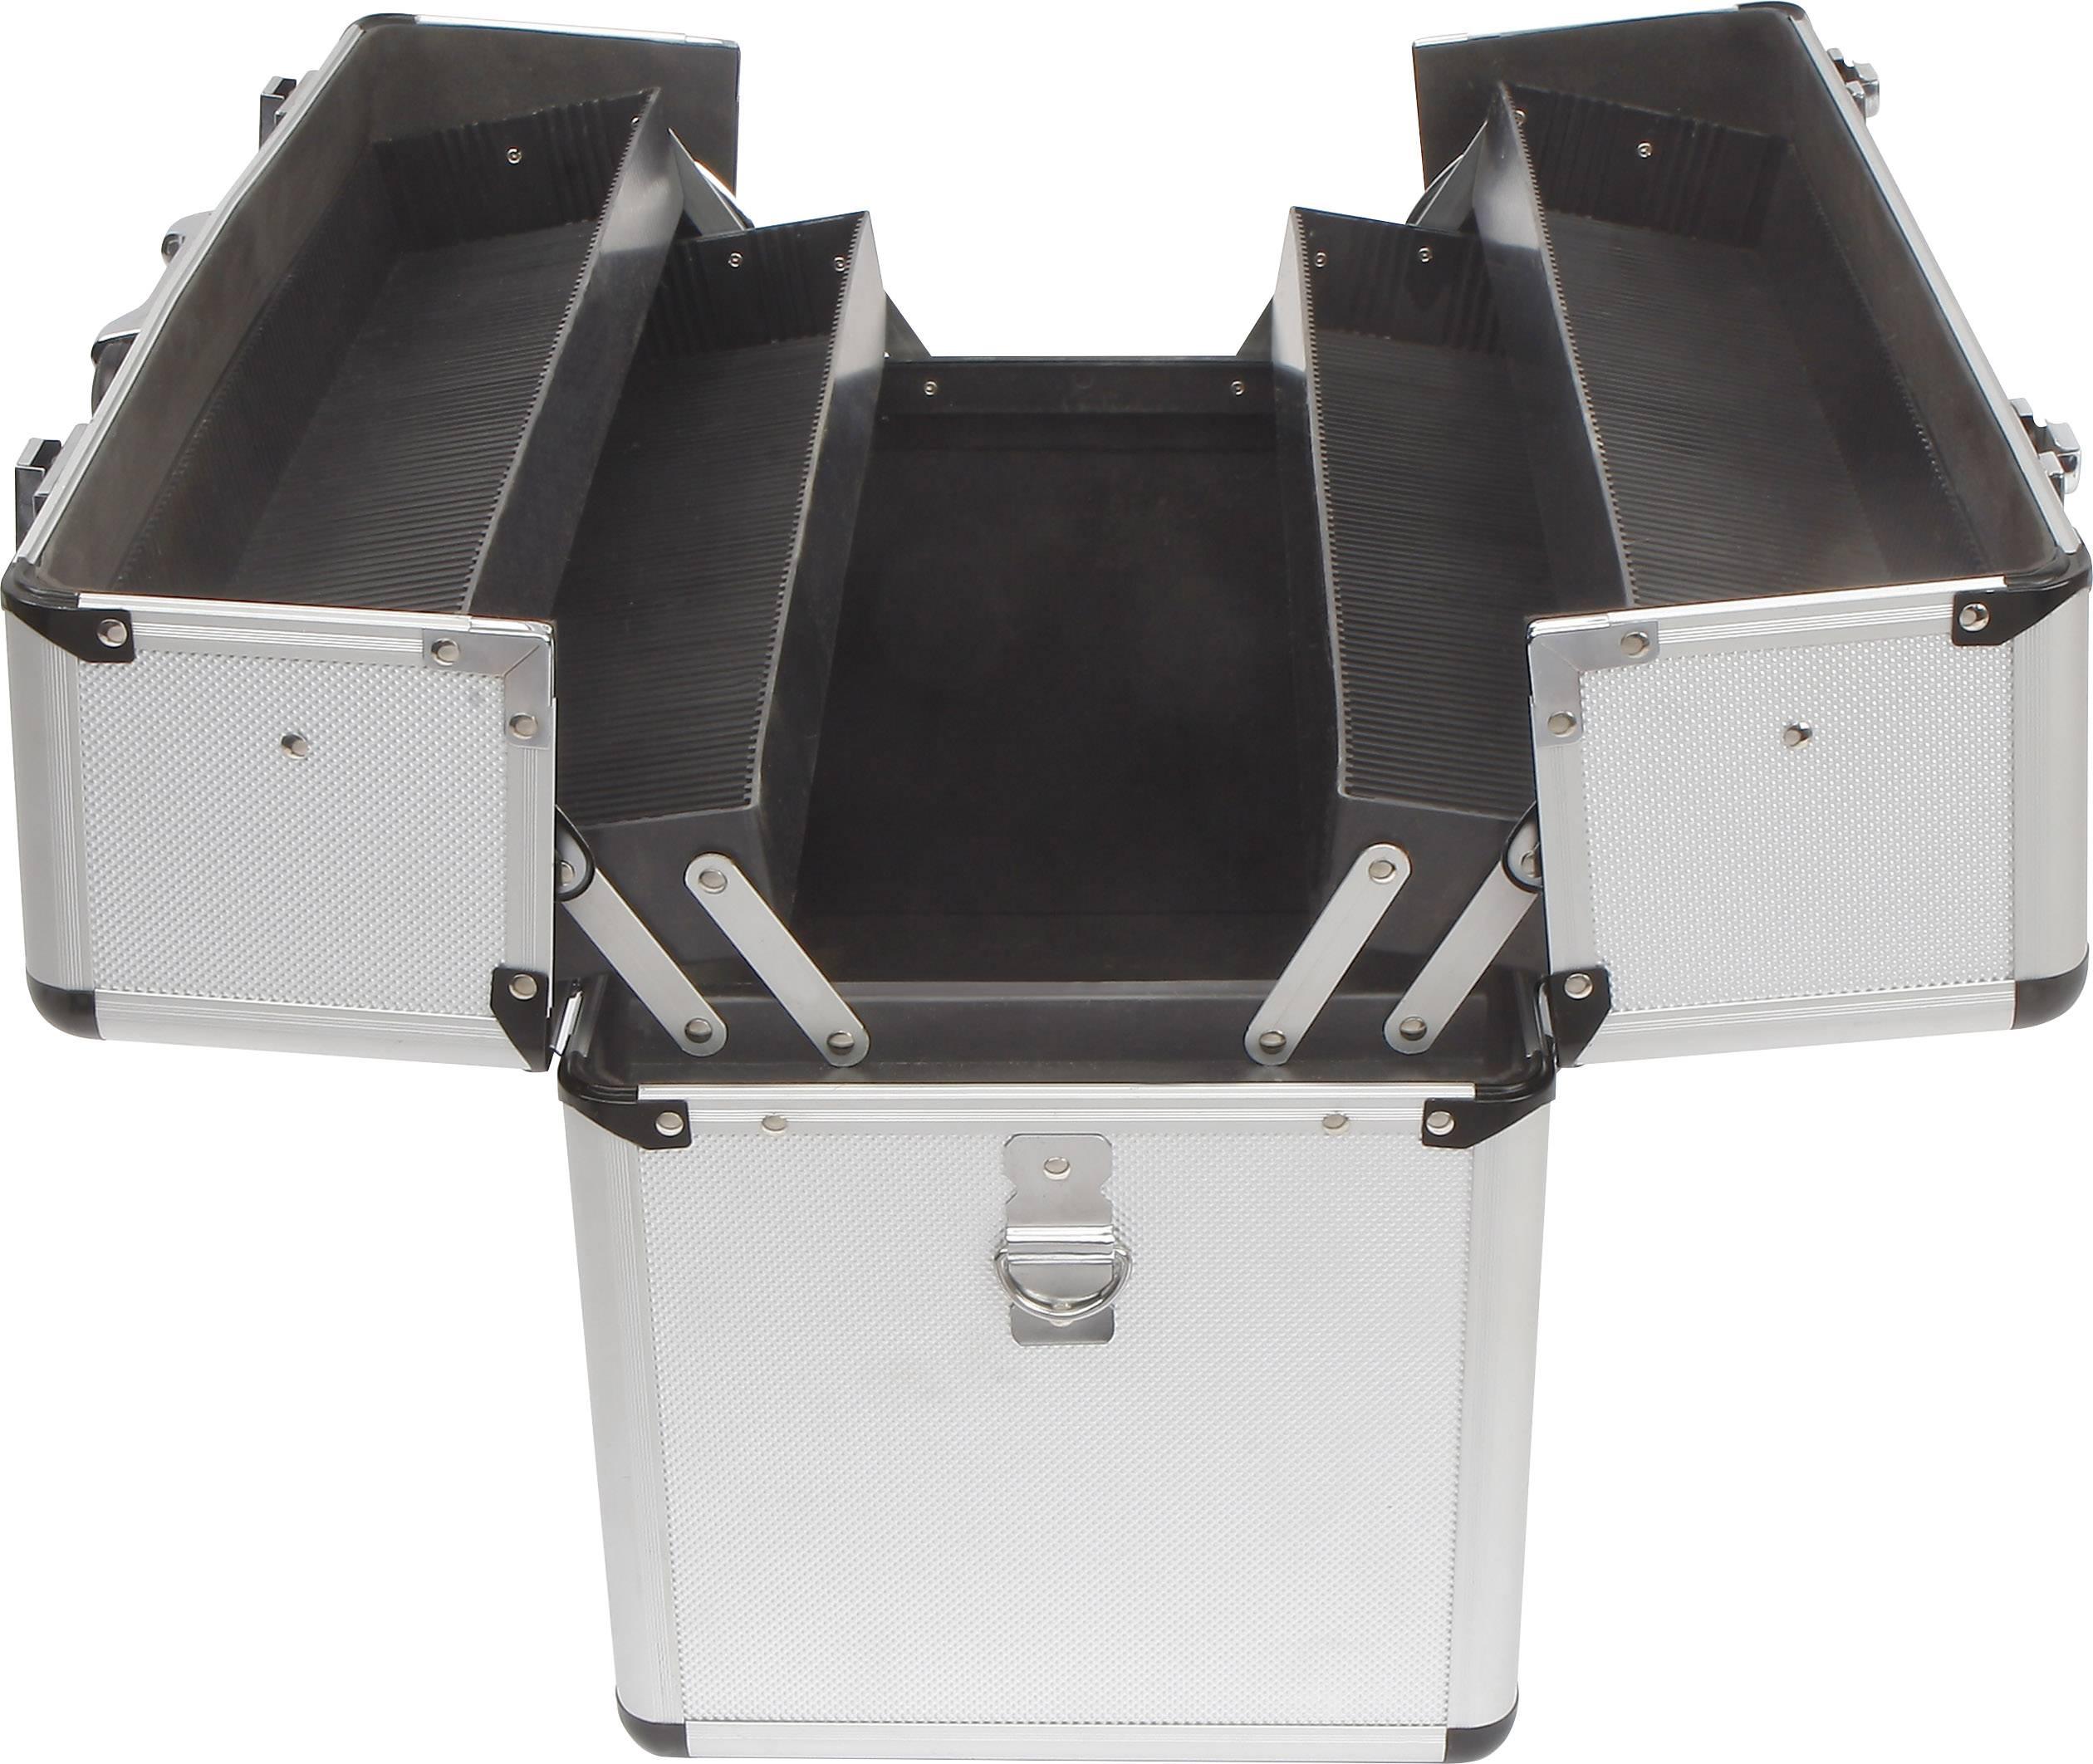 TOOLCRAFT 1409408 Universale Valigia pilota porta utensili senza contenuto (L x A x P) 450 x 320 x 225 mm